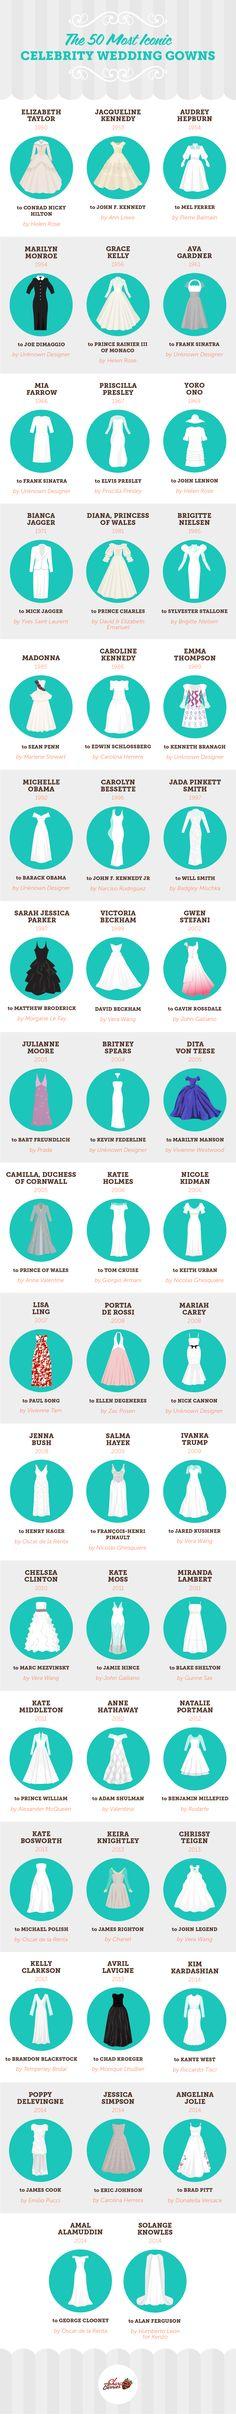 50 Amazing Celebrity Wedding Dresses - Shari's Berries Blog